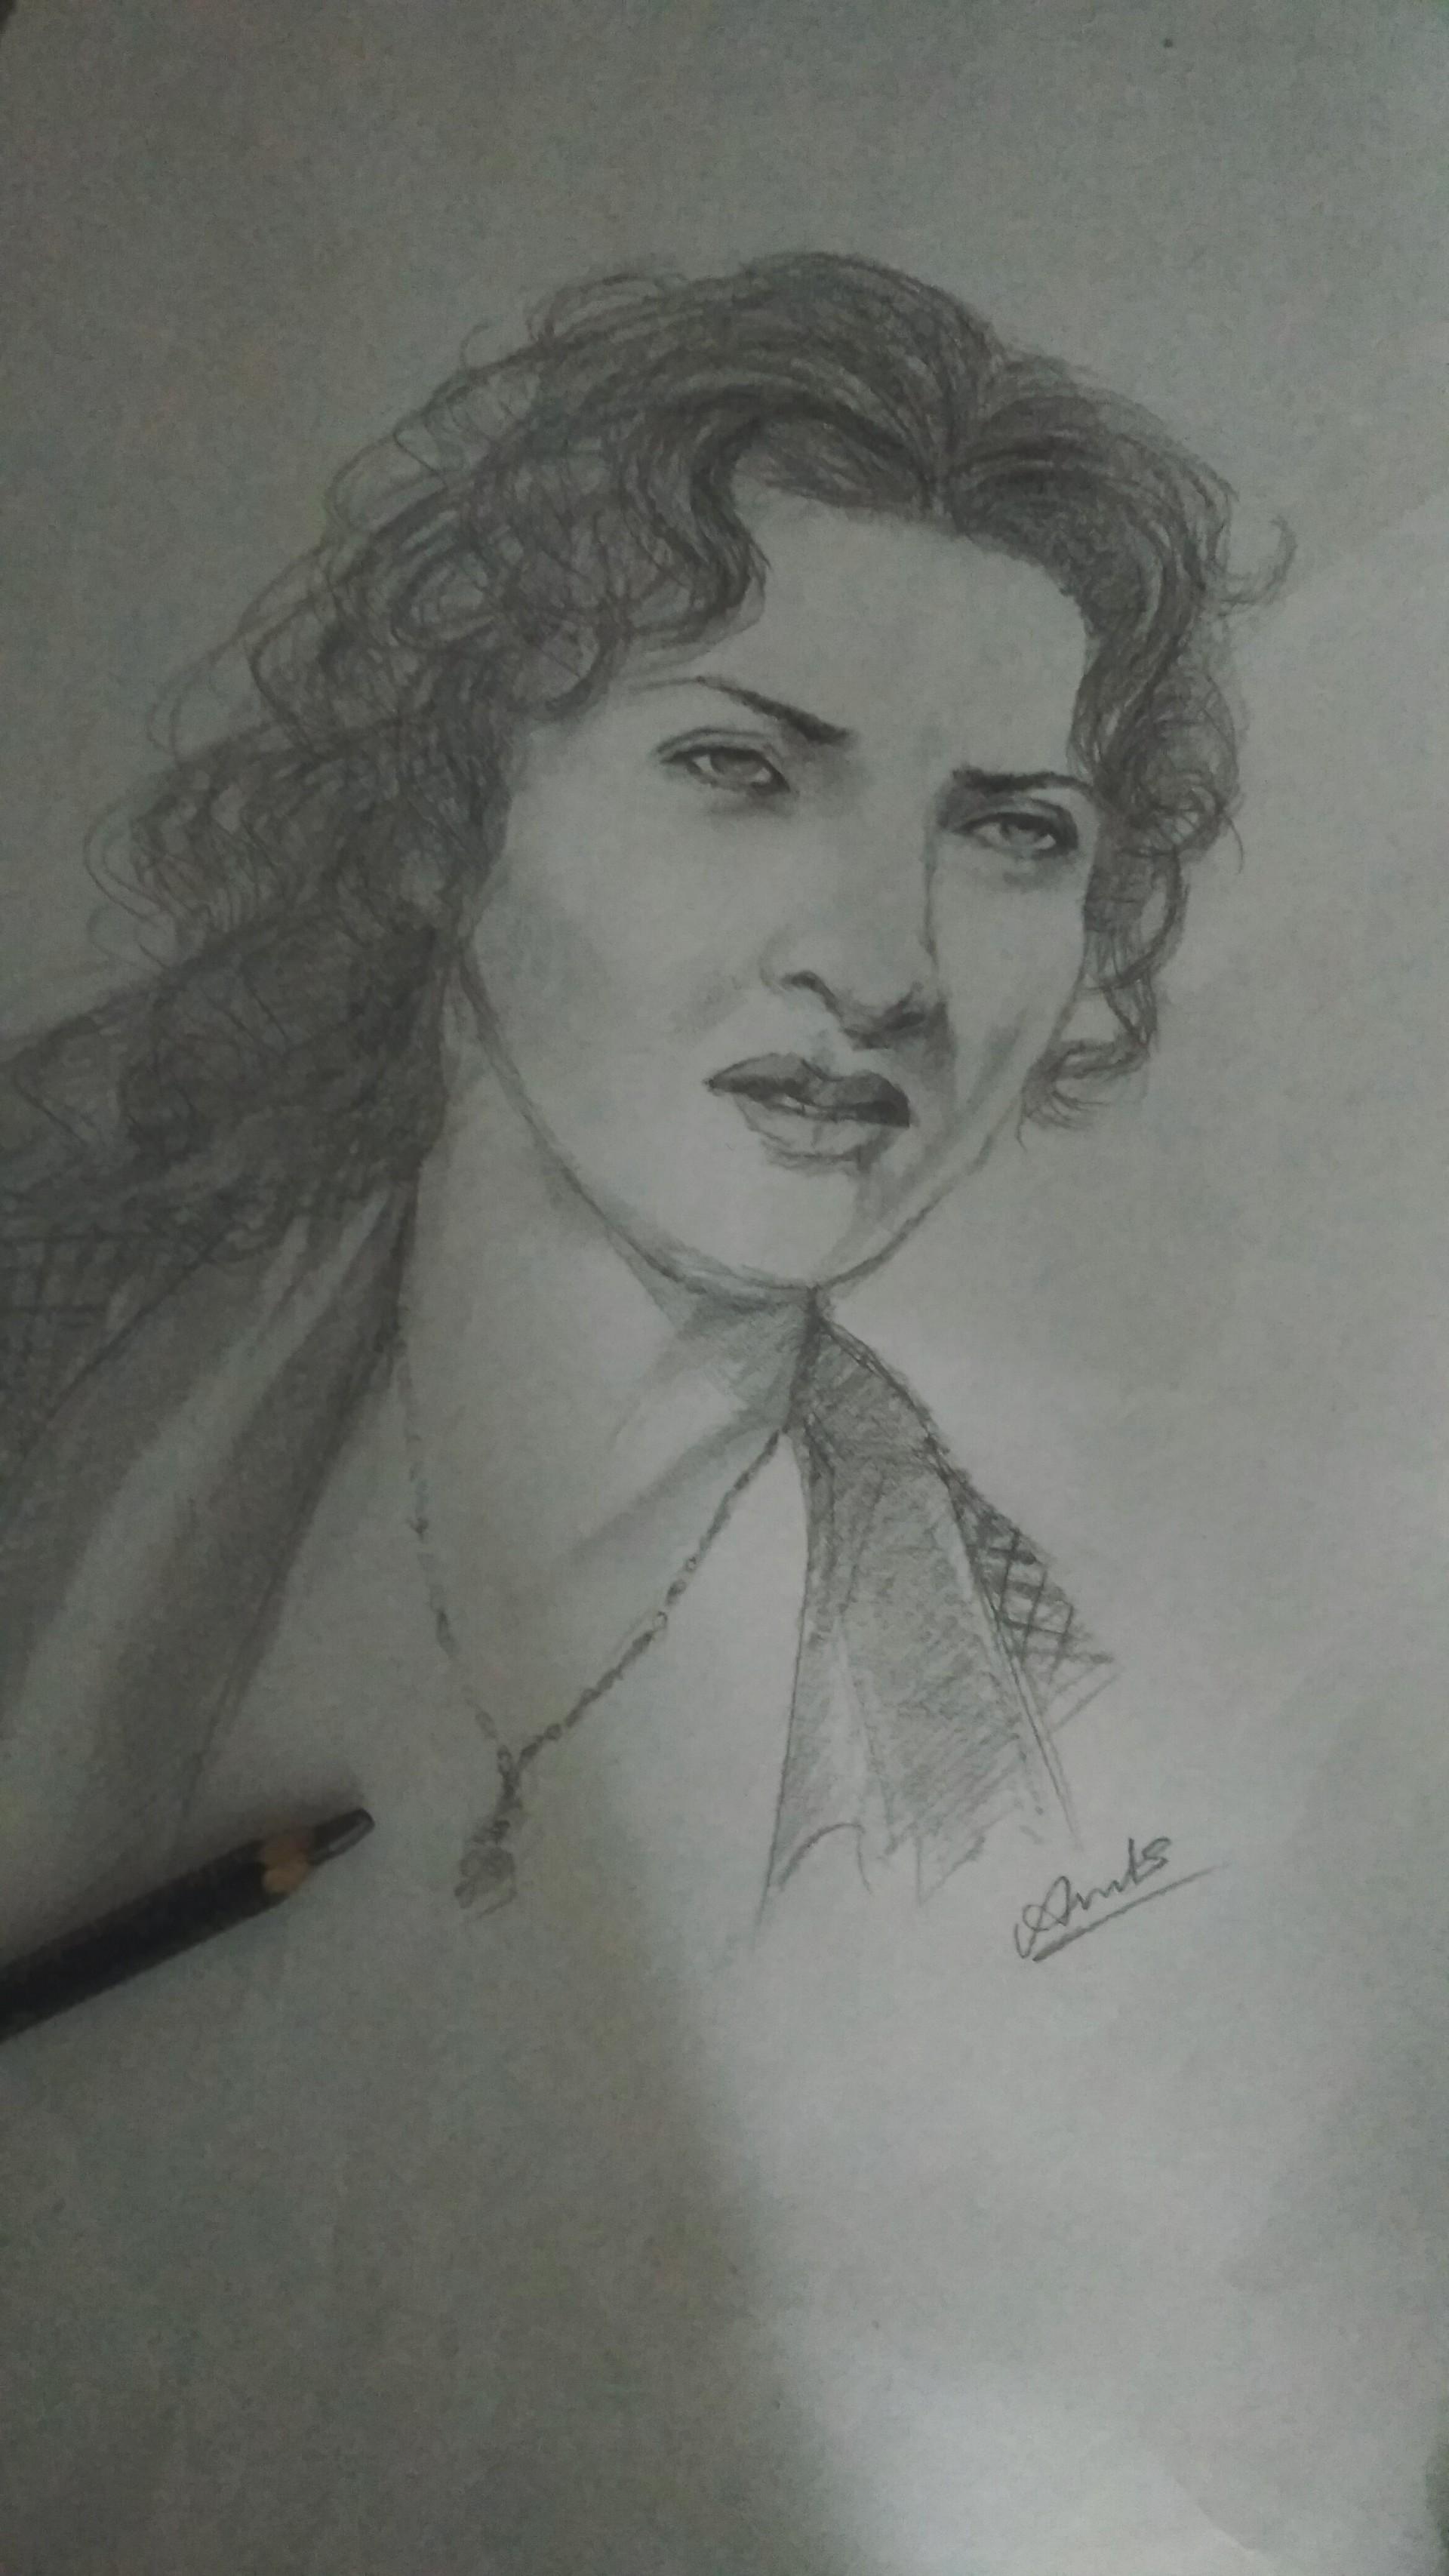 Portrait drawing of a beautiful woman